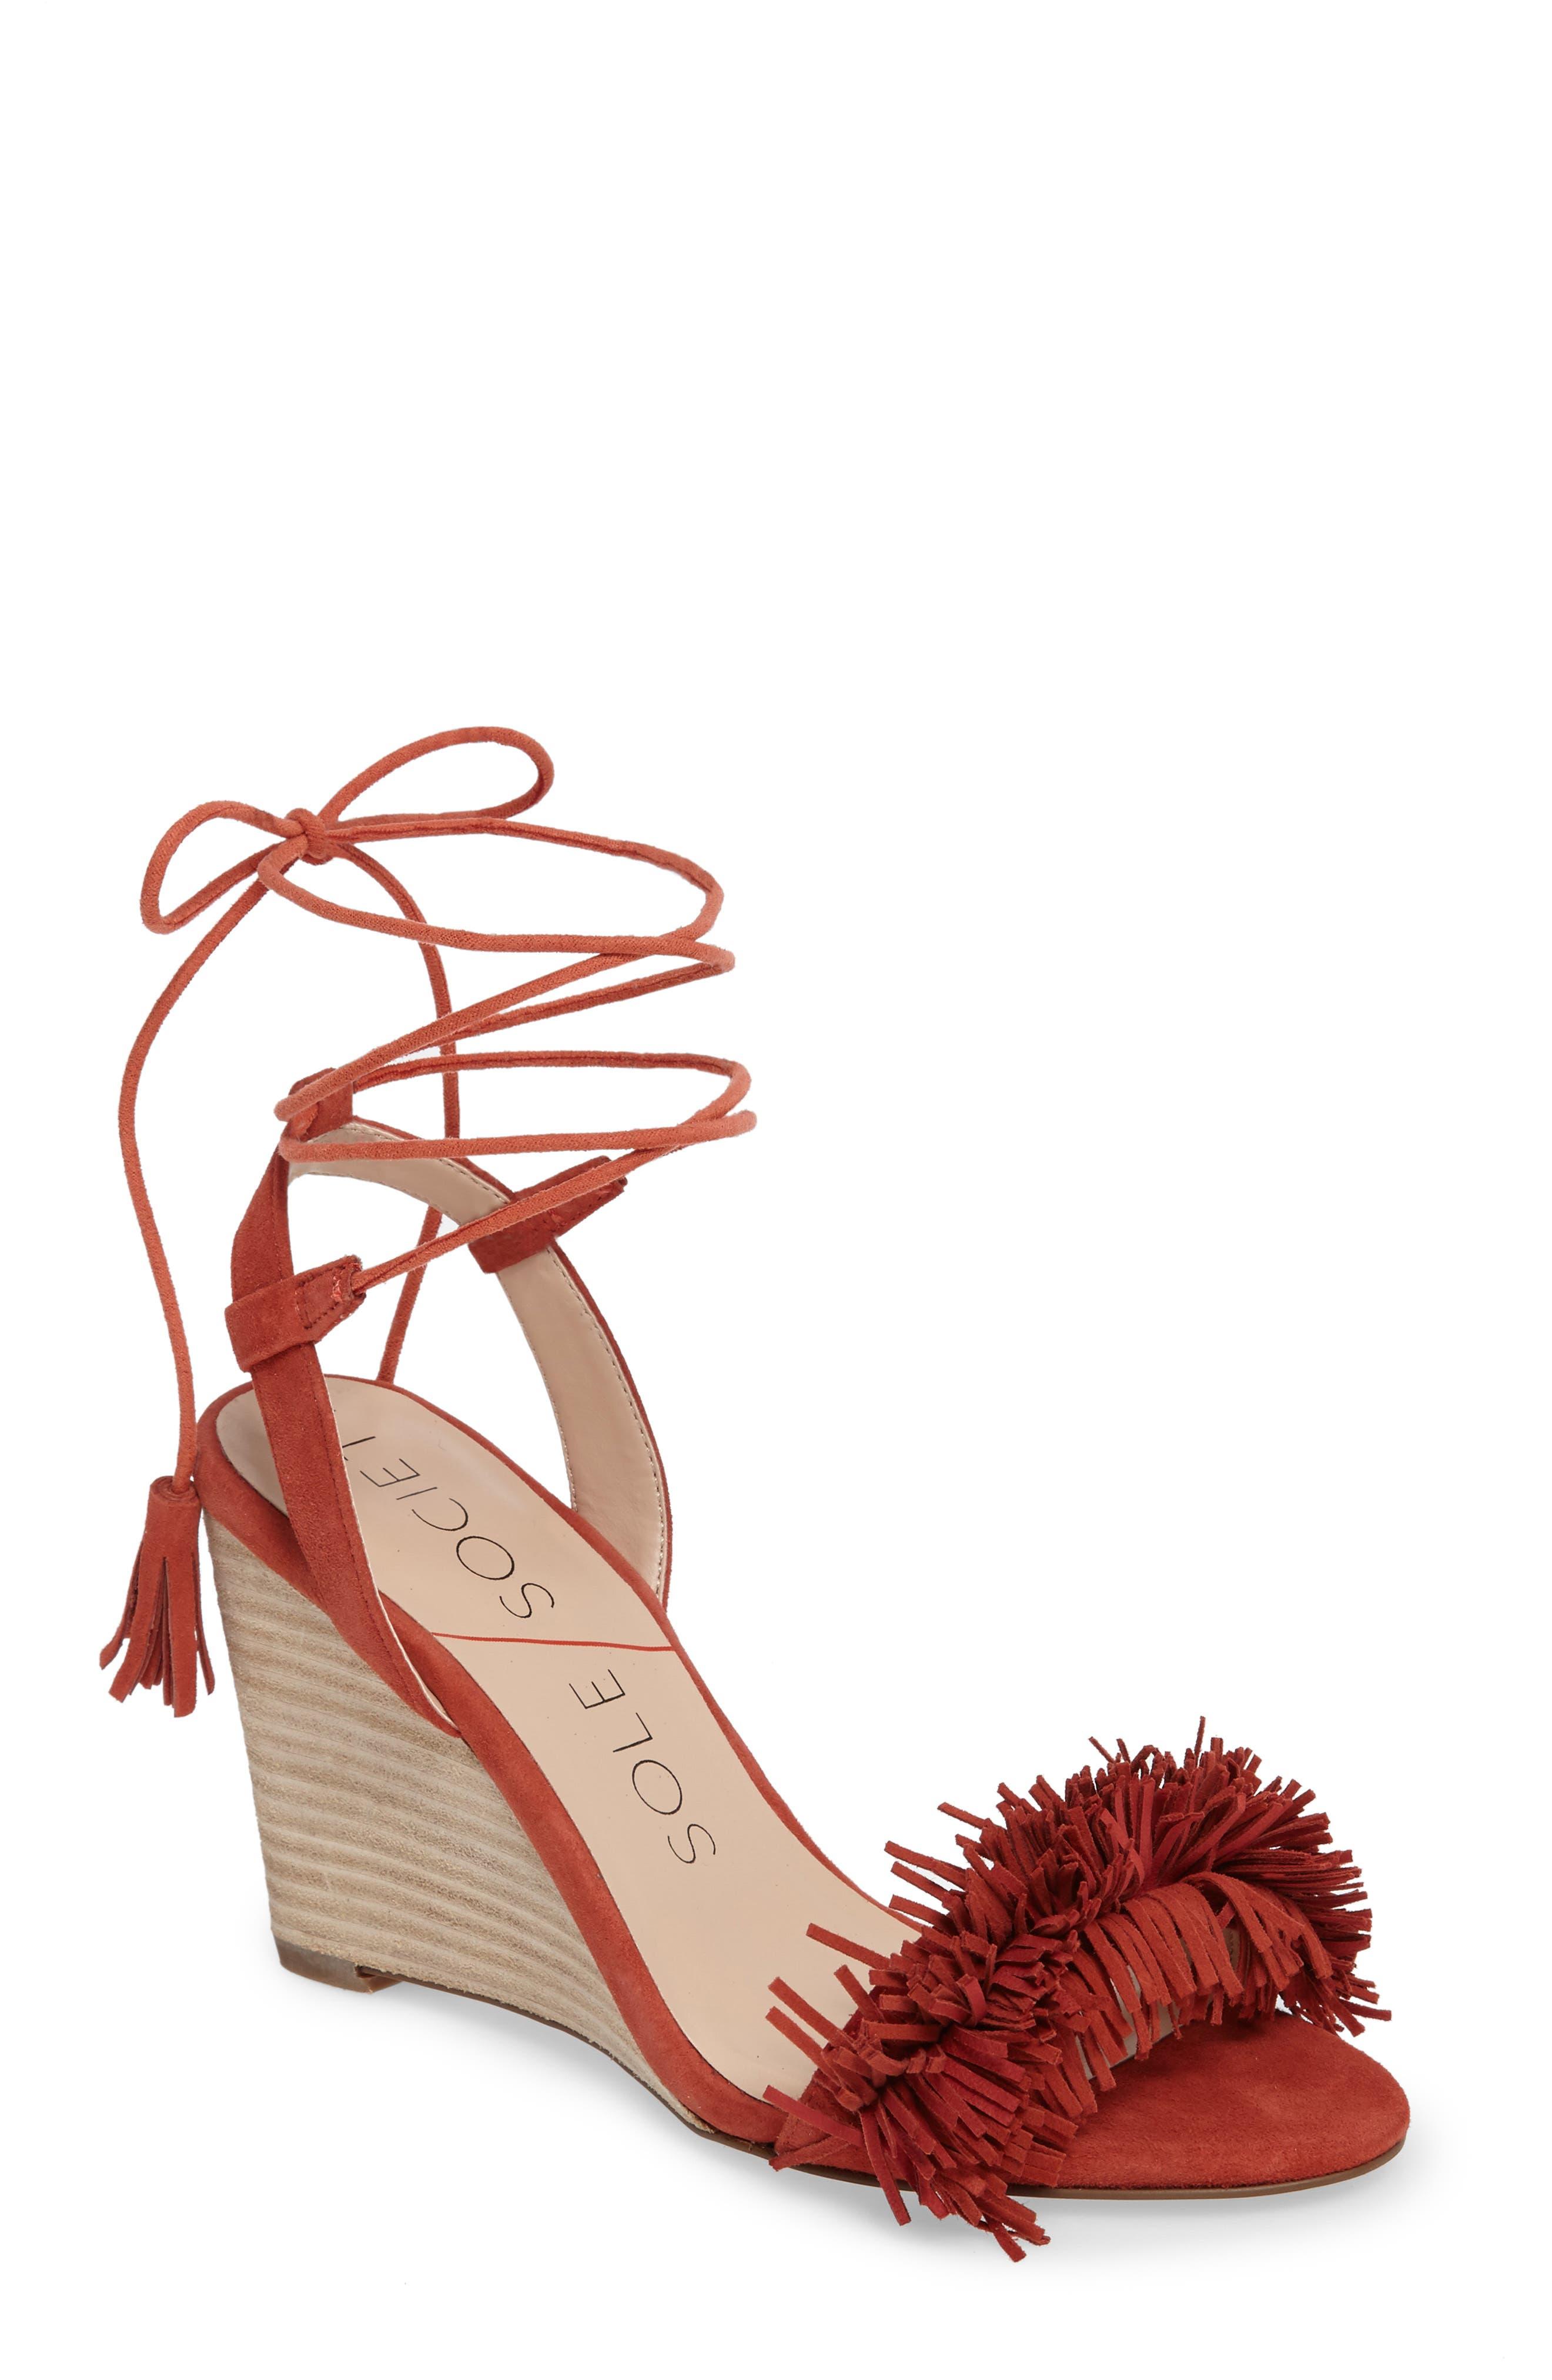 Alternate Image 1 Selected - Sole Society Rosea Ankle Wrap Sandal (Women)